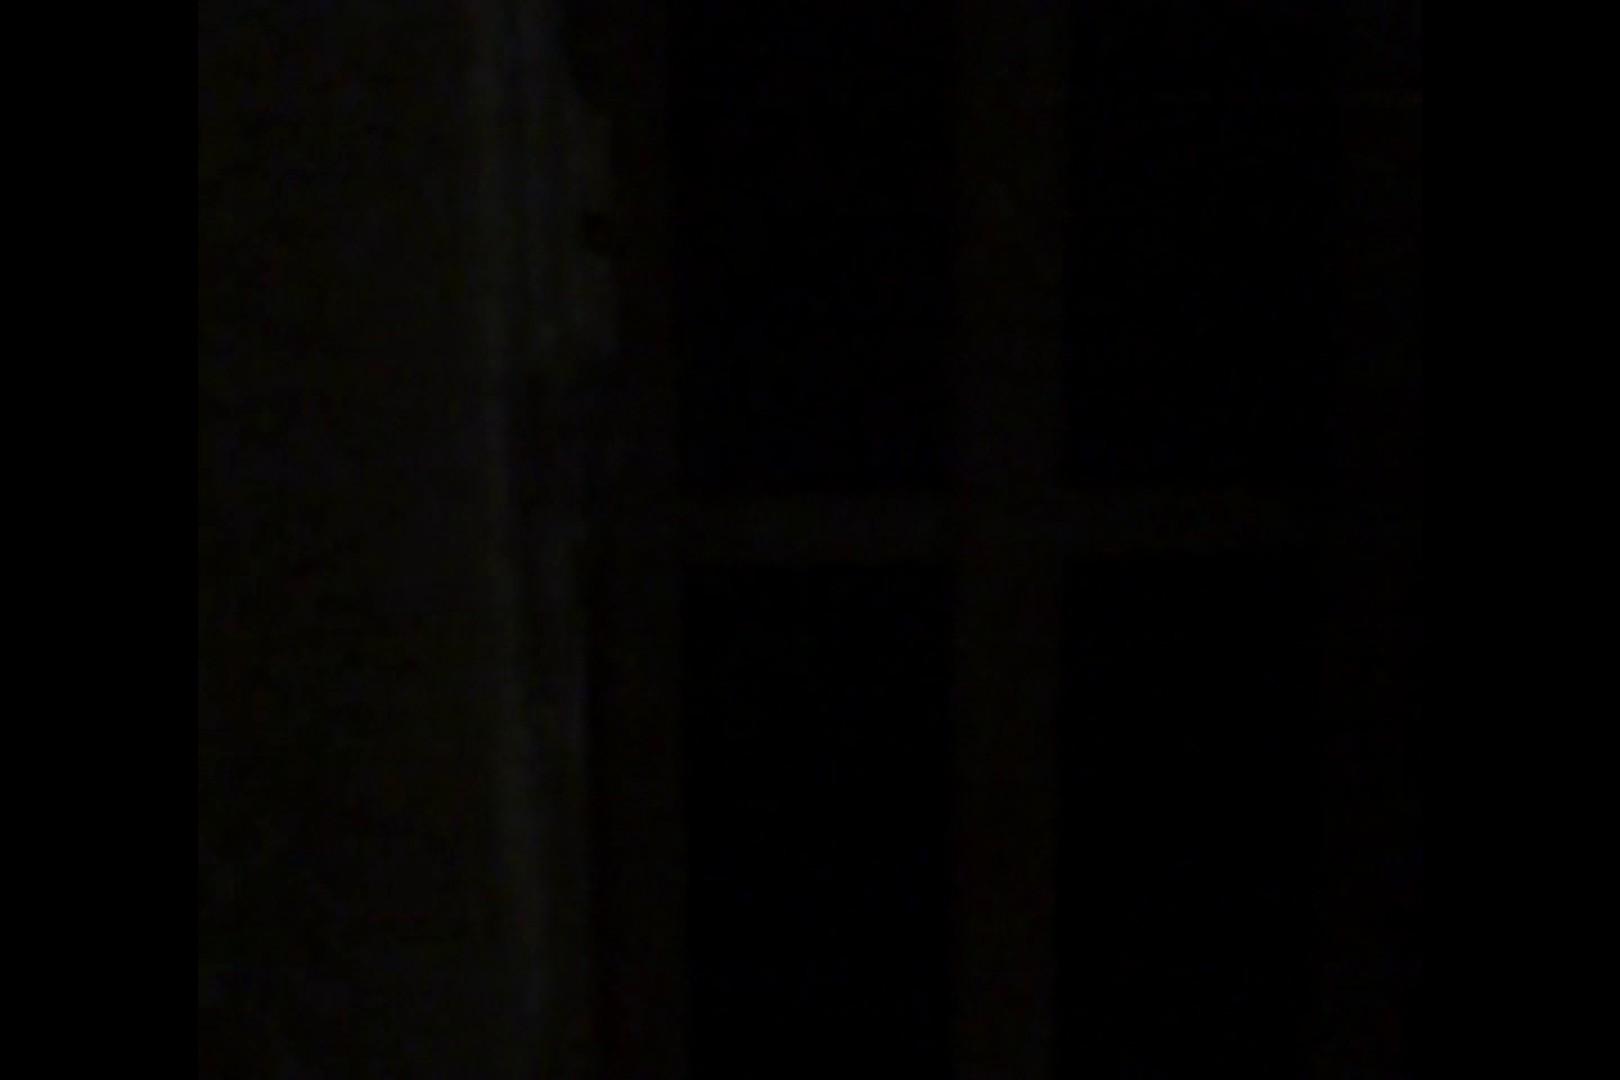 Came back チンピースさん!!vol.03 スリム美少年系ジャニ系 ちんこ画像 73枚 21